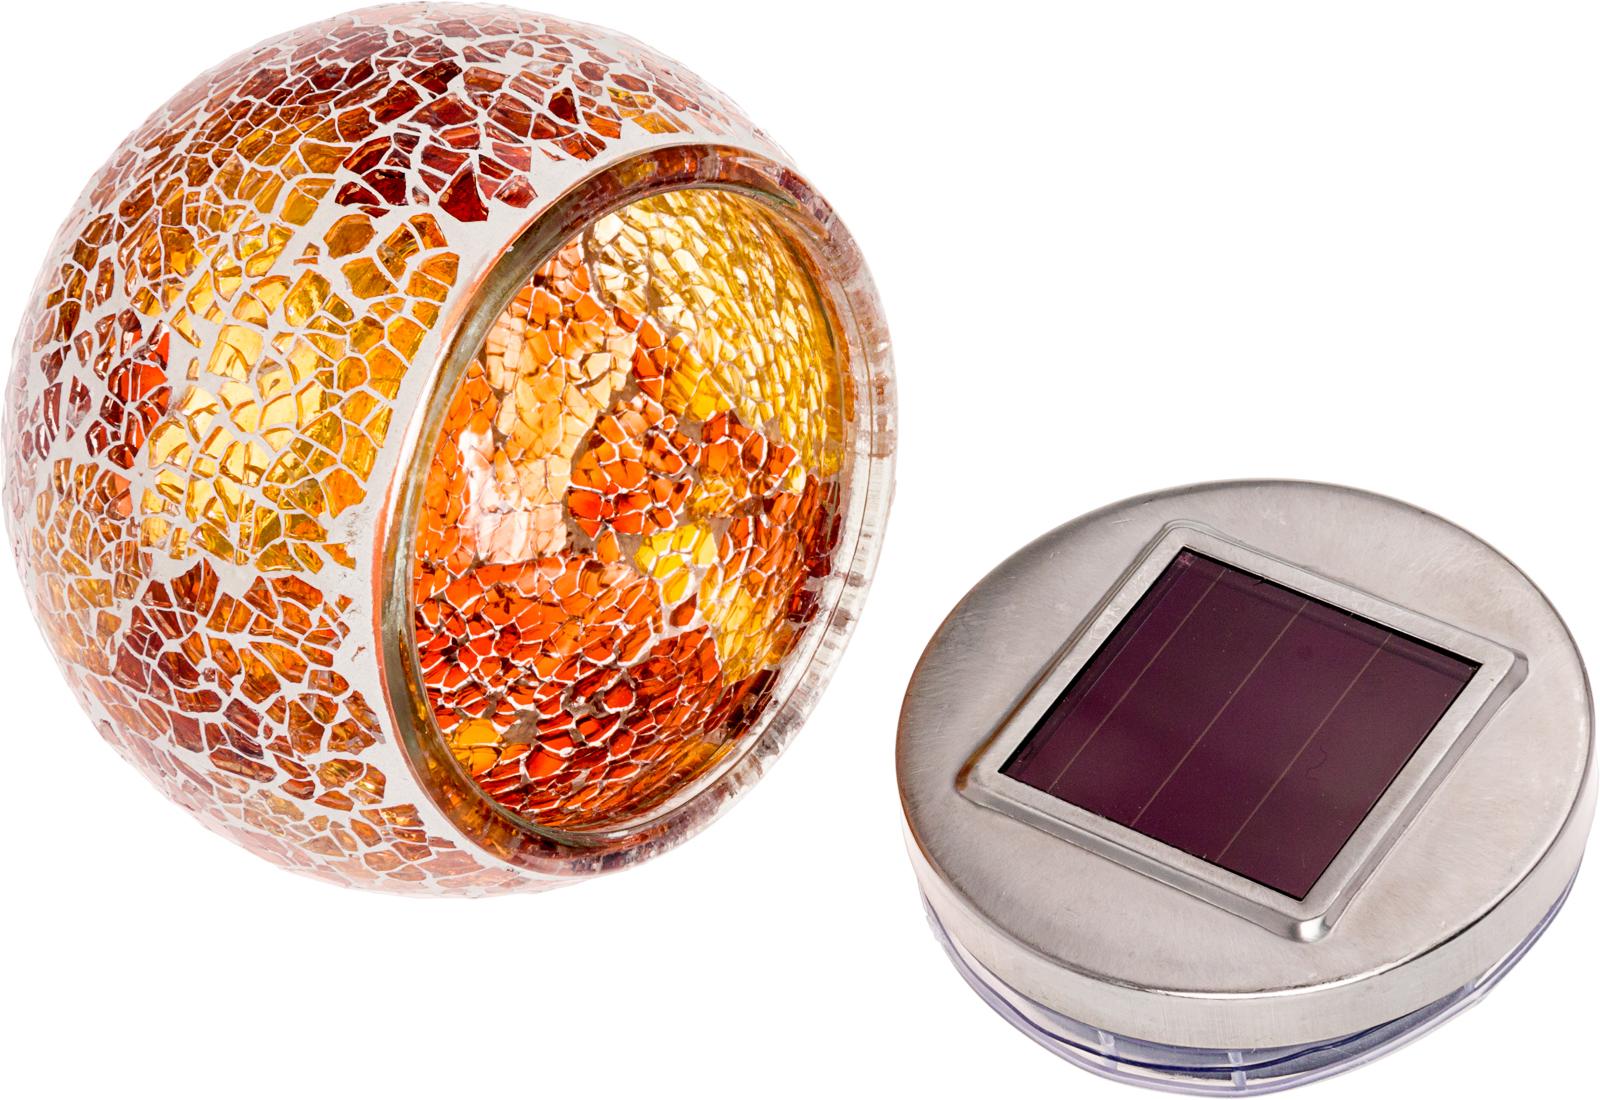 GreenLighting Mosaic Decorative Outdoor Solar LED Ball